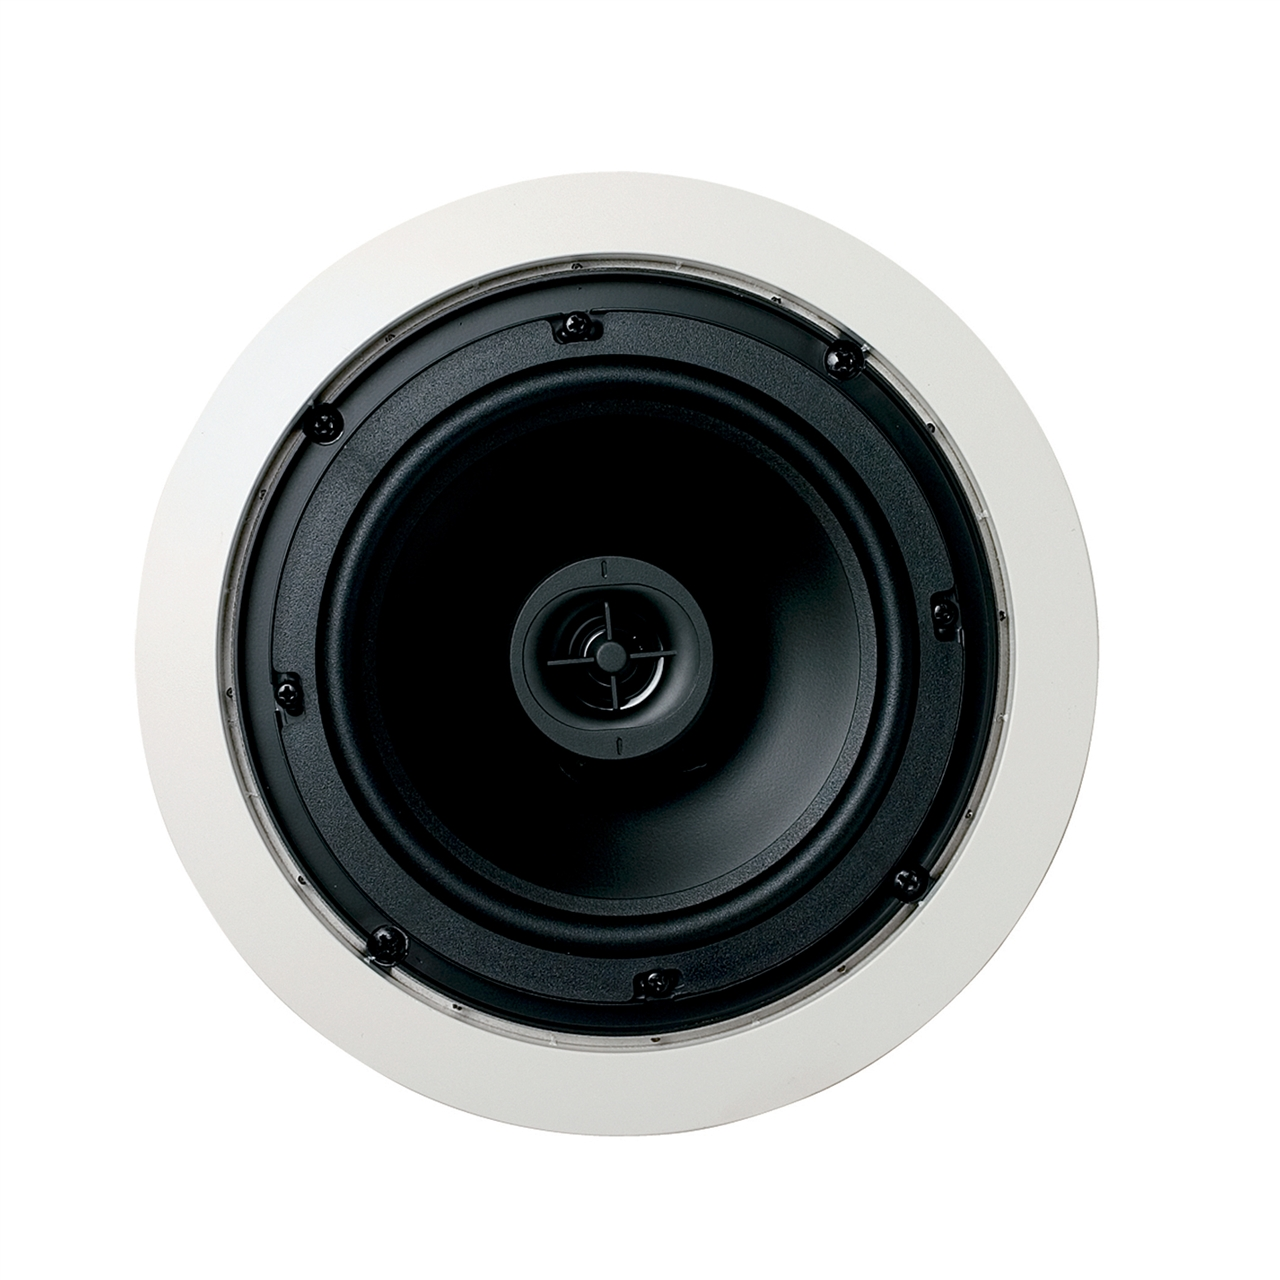 JAMO-尊宝6.5CS嵌入墙式家庭影院吊顶吸顶喇叭音箱背景环绕全景声